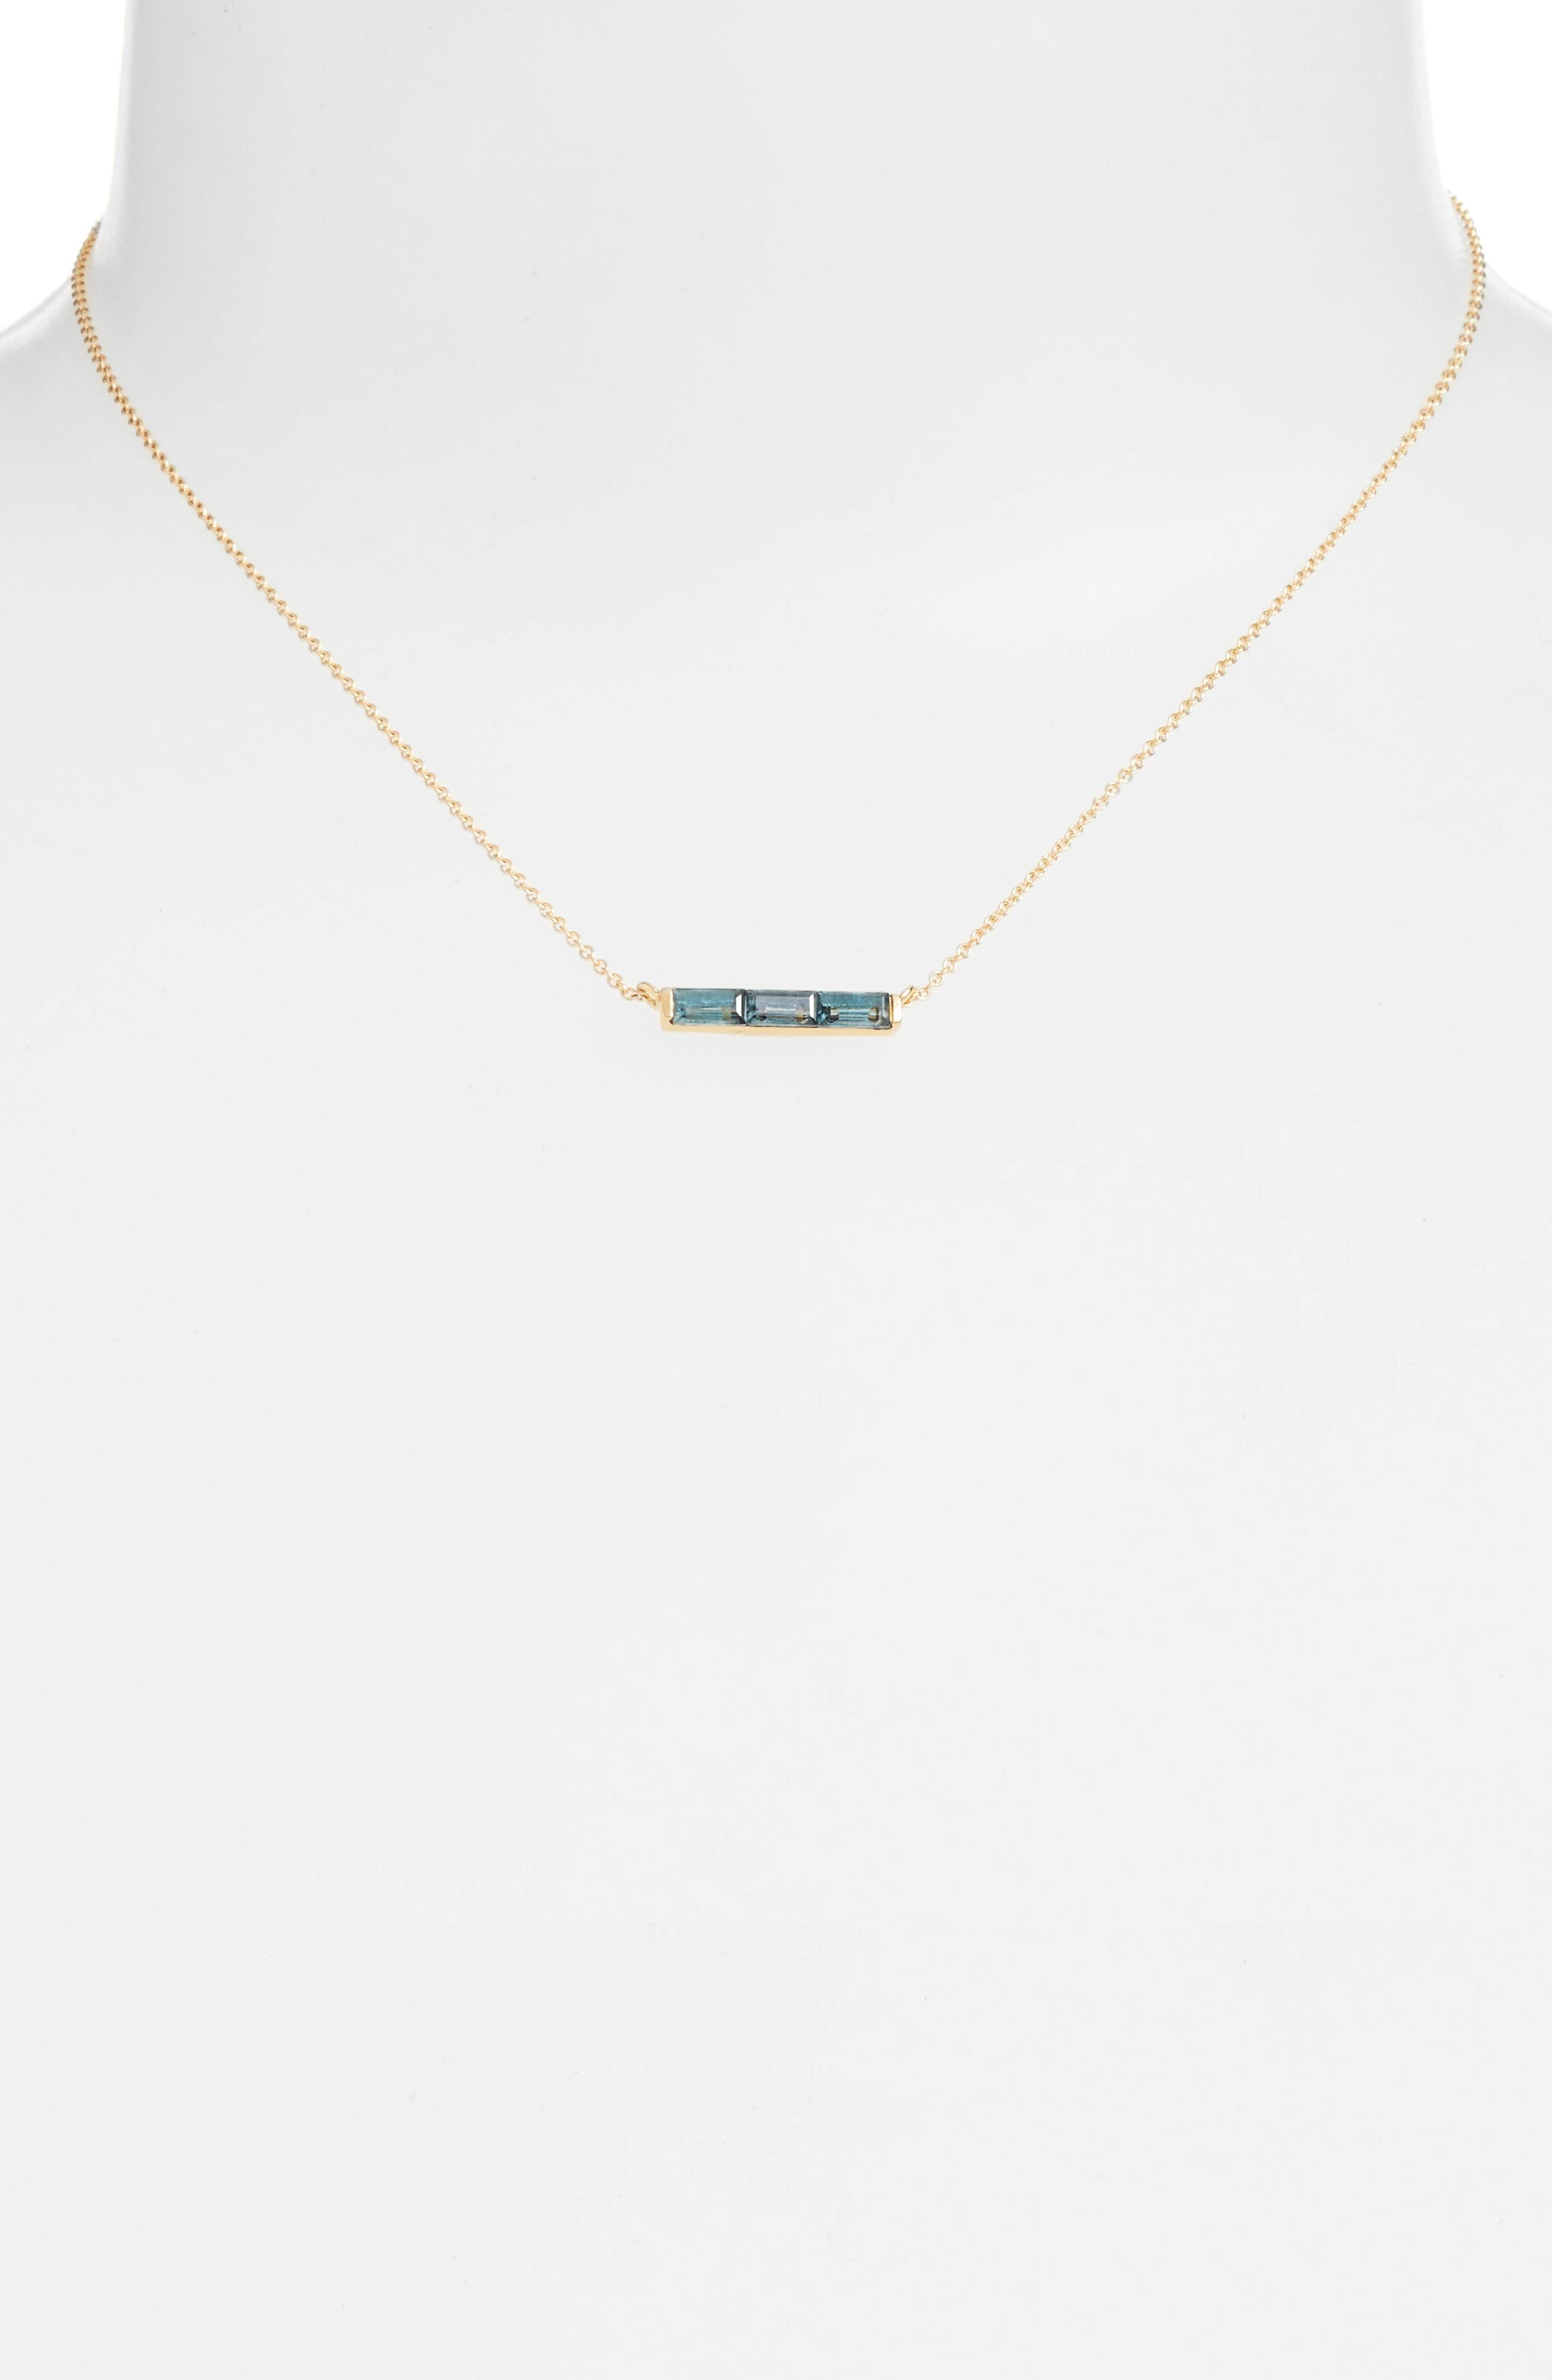 Channel Set Semiprecious Stone Necklace,                             Alternate thumbnail 5, color,